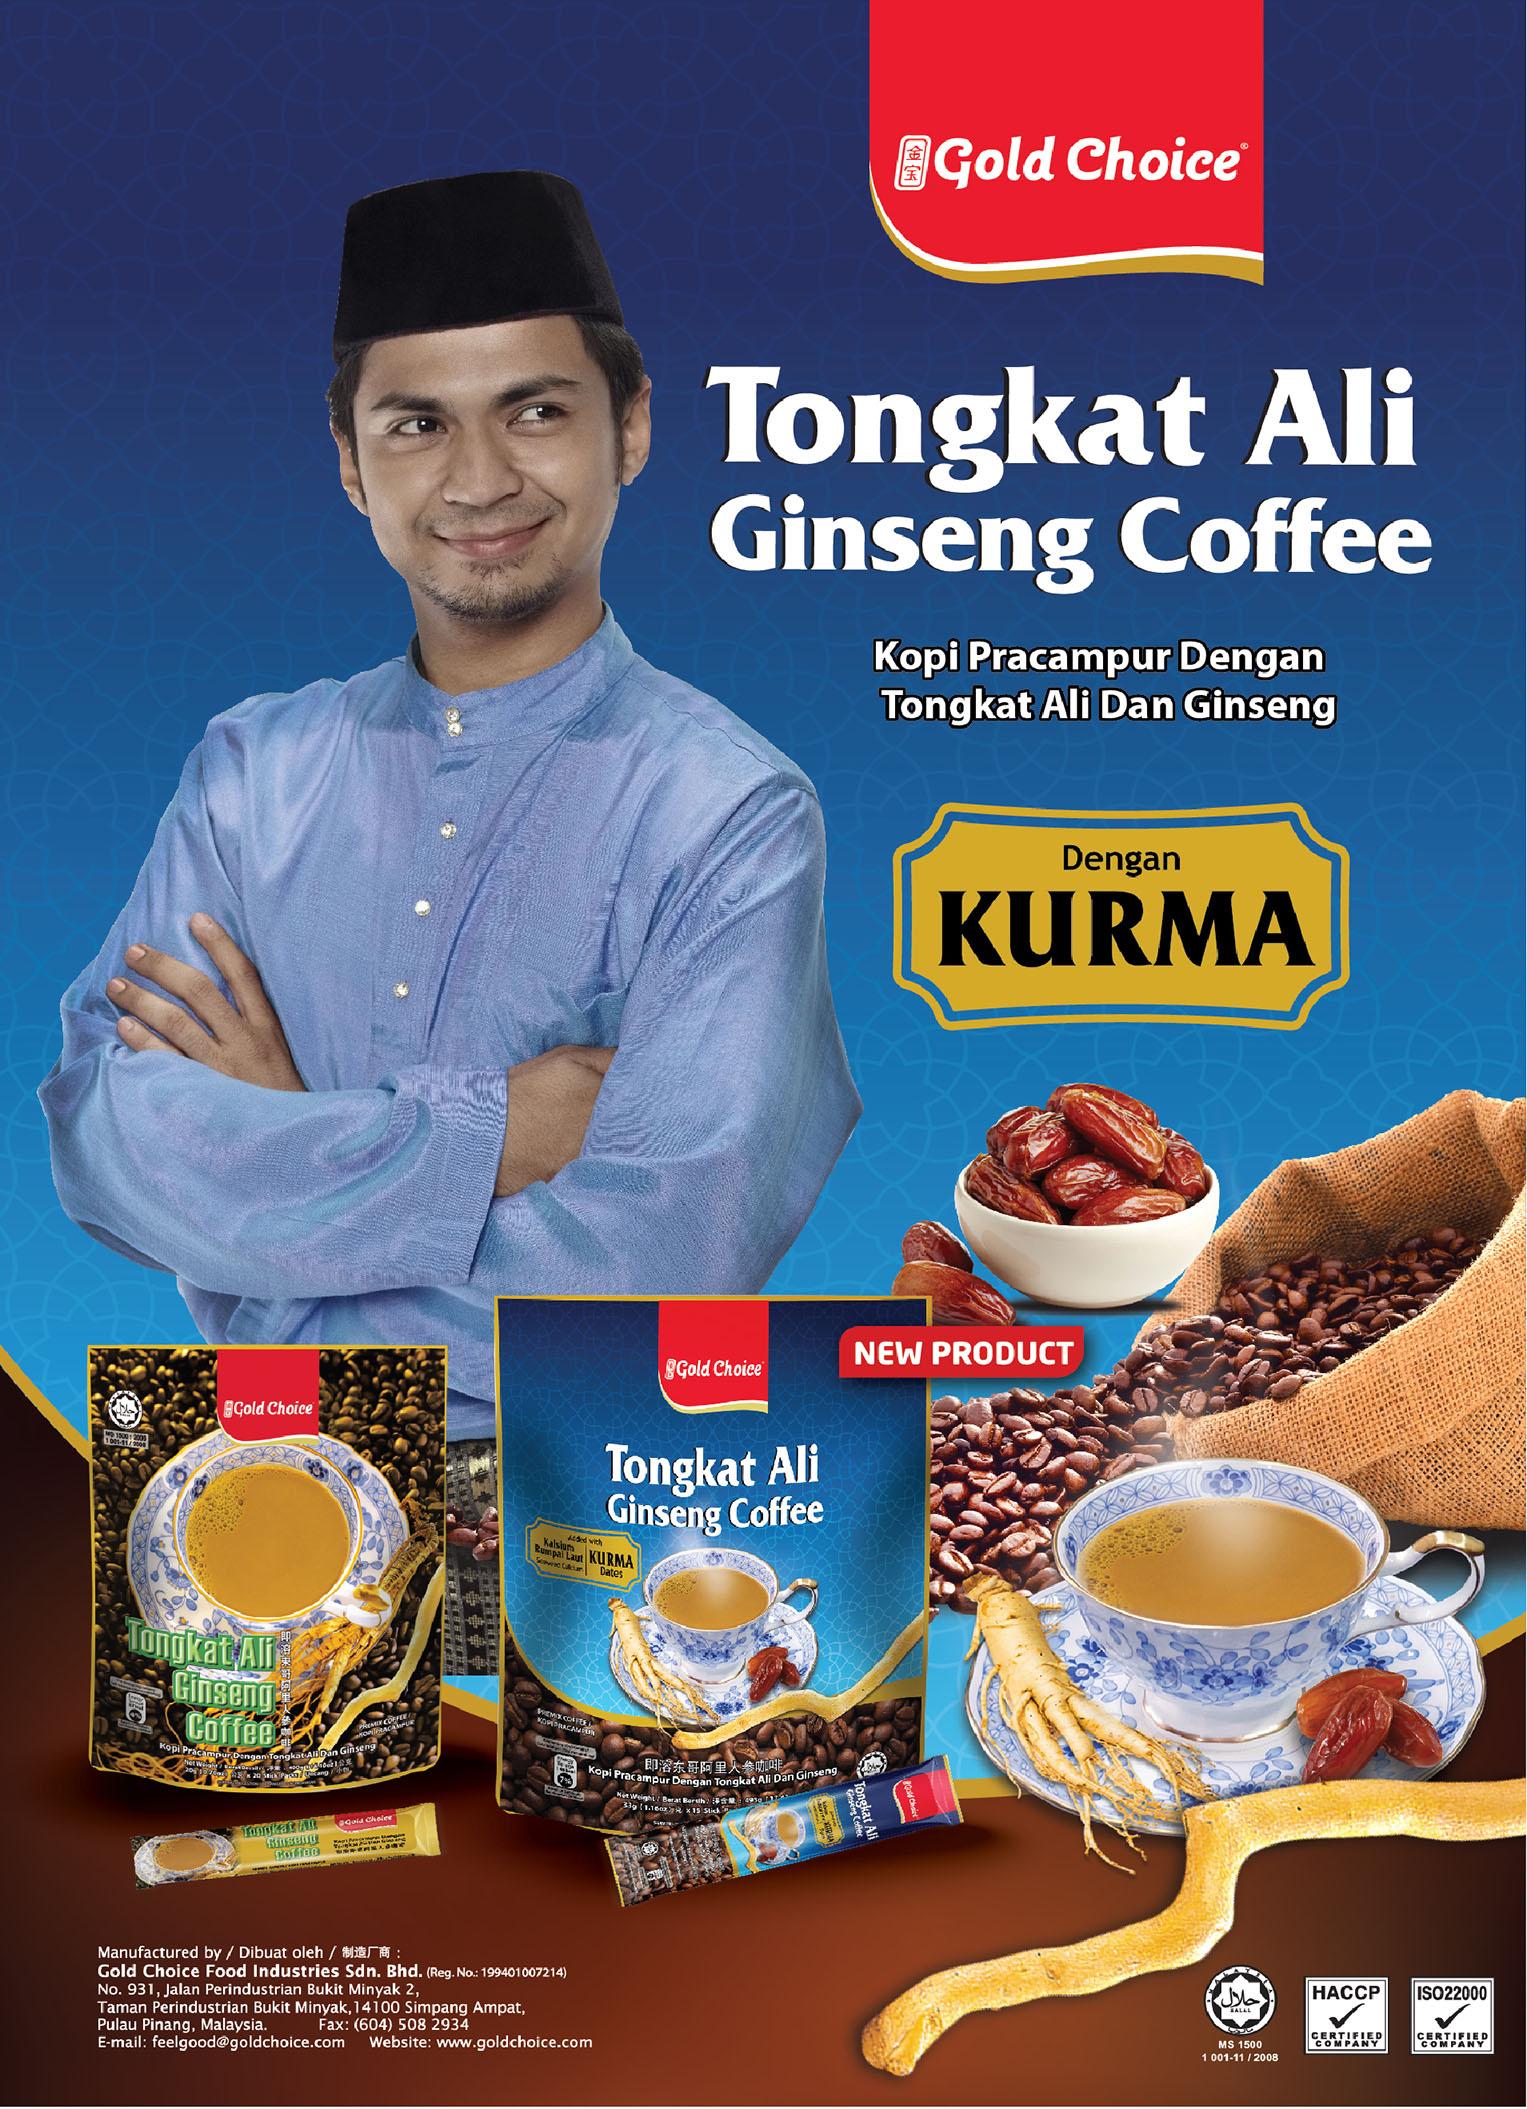 GOLD CHOICE Tongkat Ali Ginseng Coffee - (20g X 20'S) X 6 Packs In Bundle